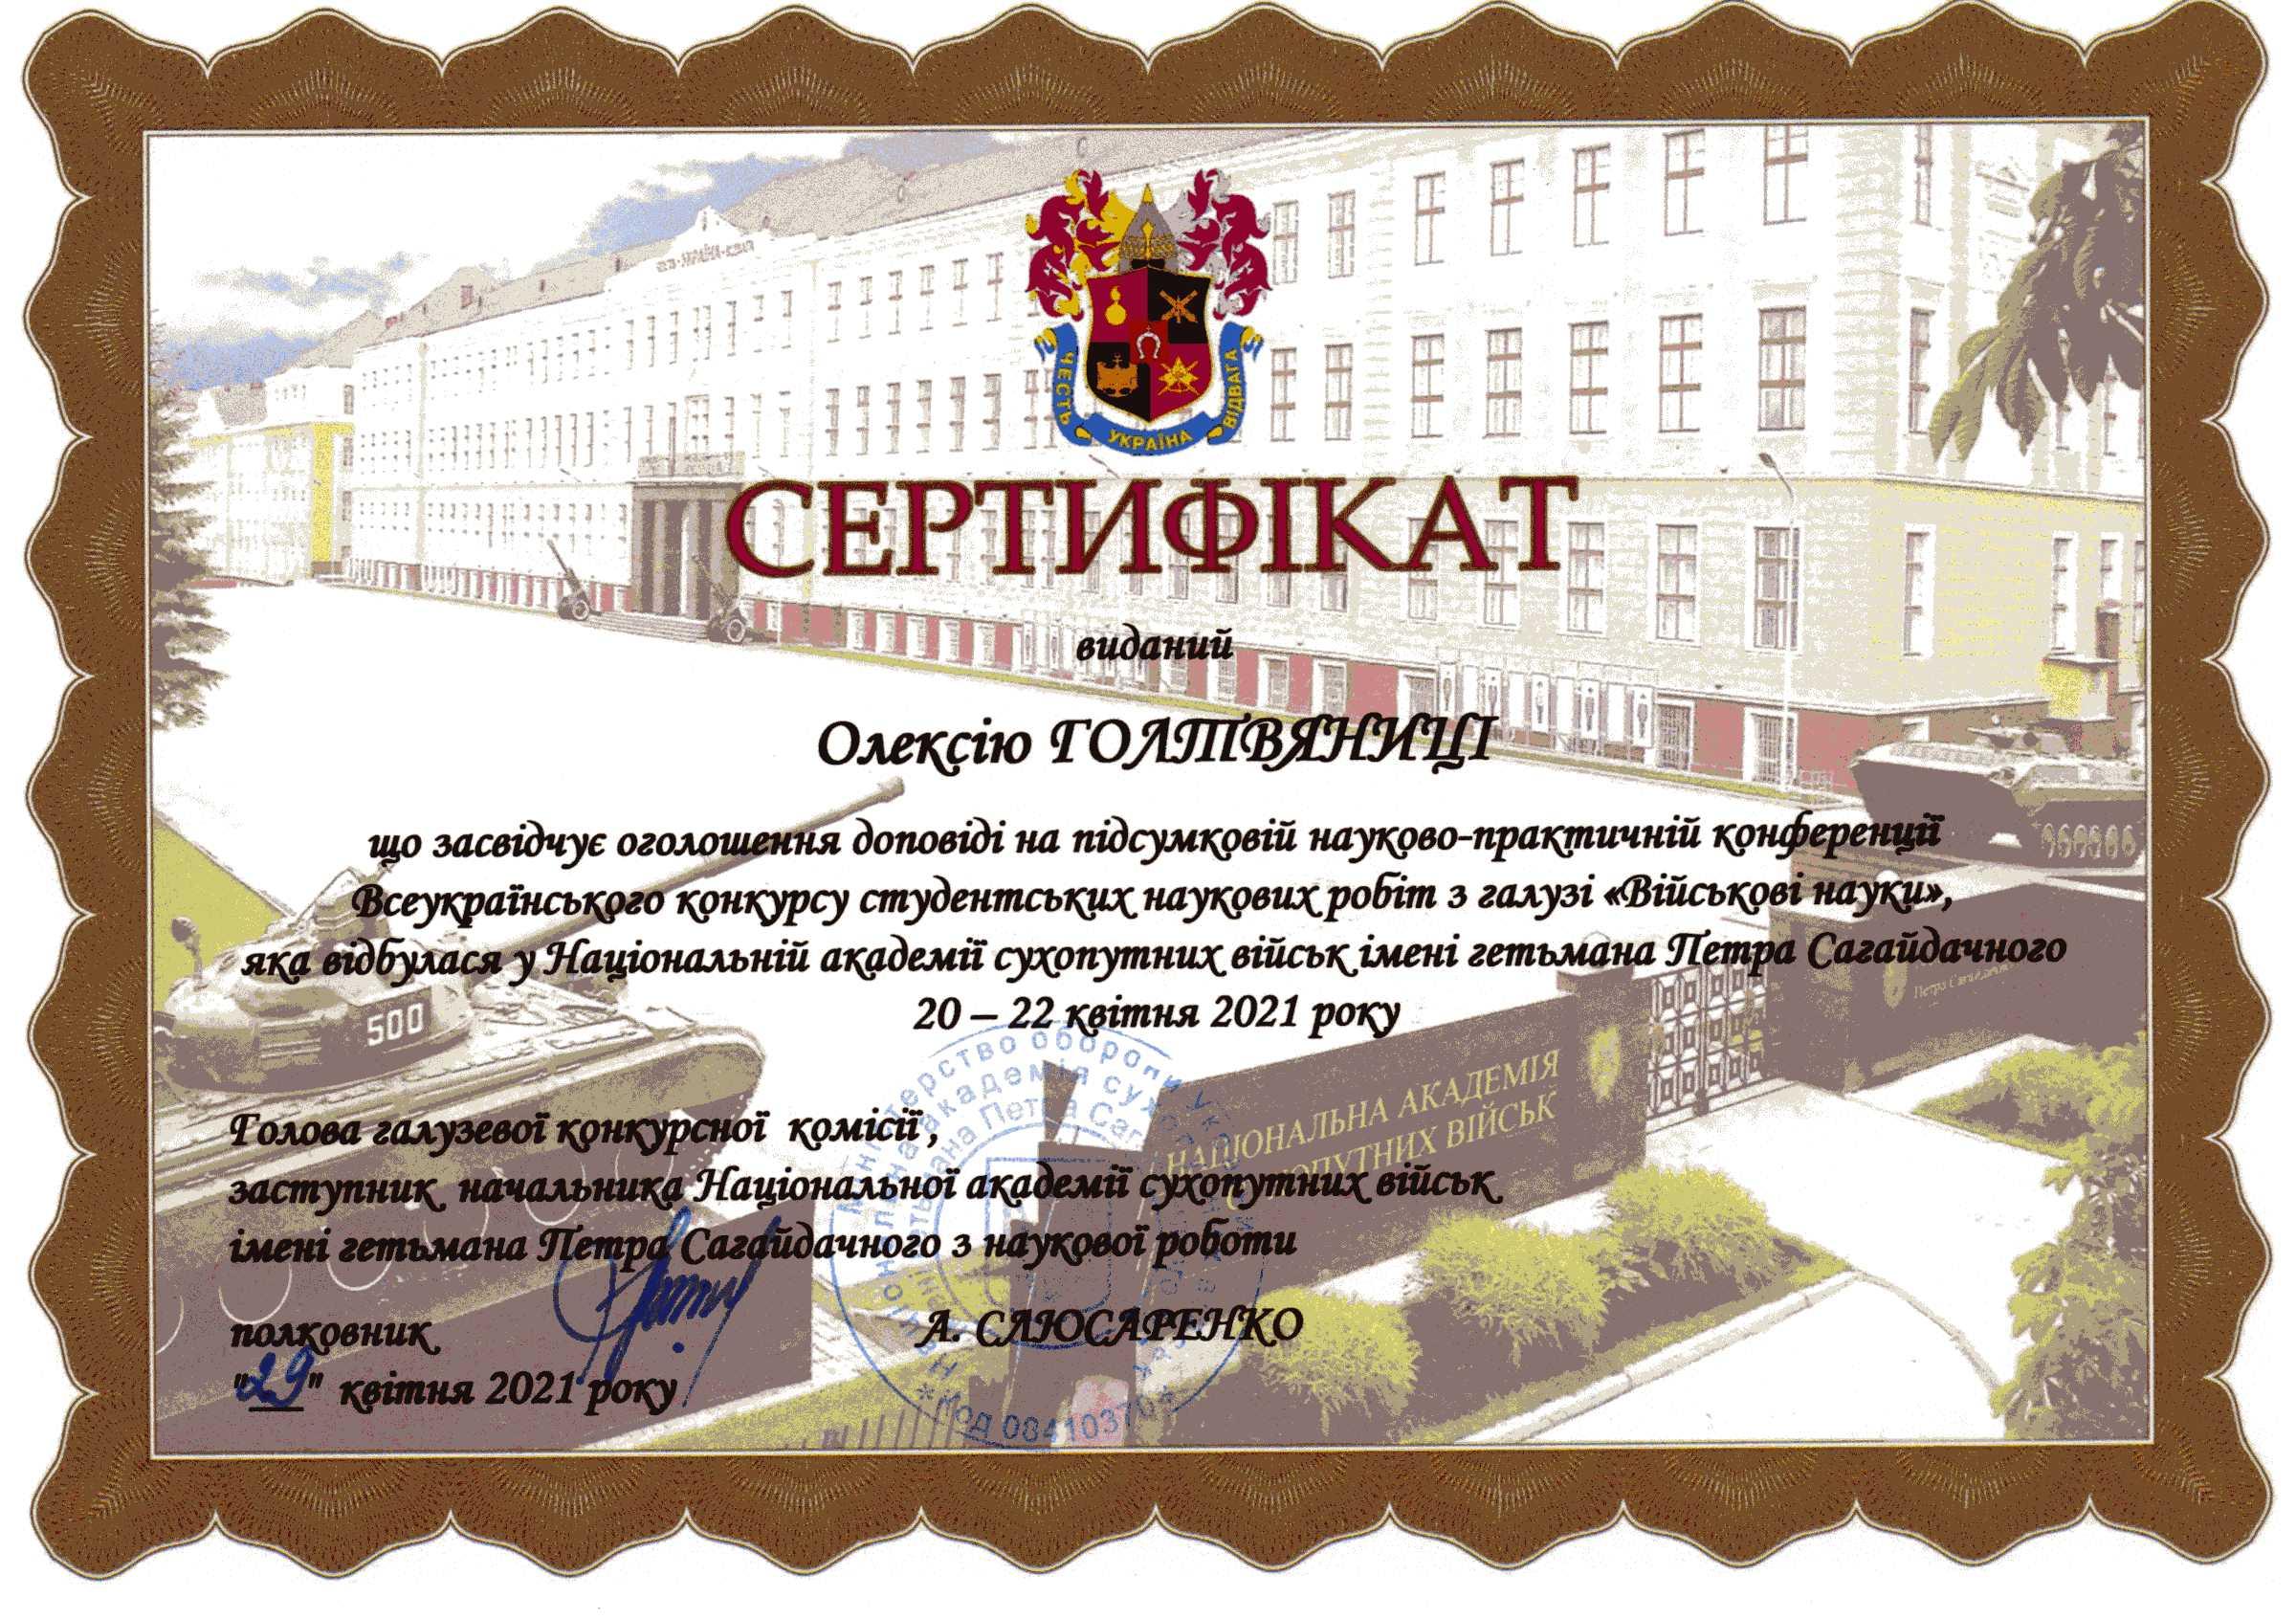 Сертиф Голтвяниця участь Львів 2021